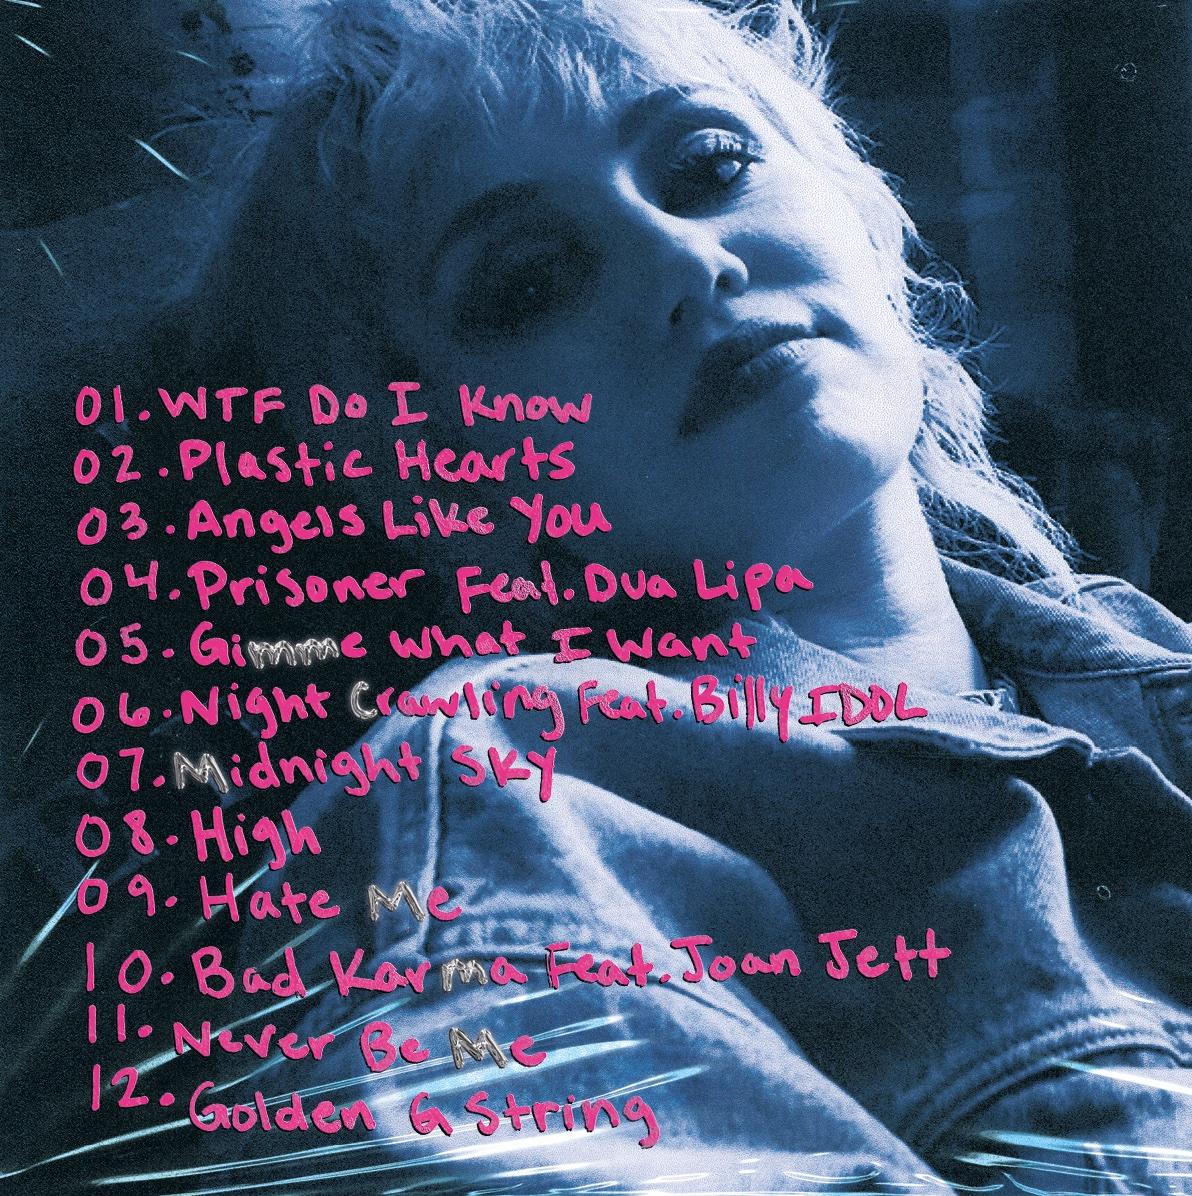 Miley Cyrus - Σελίδα 7 Emt-d26VEAAlImn?format=jpg&name=medium